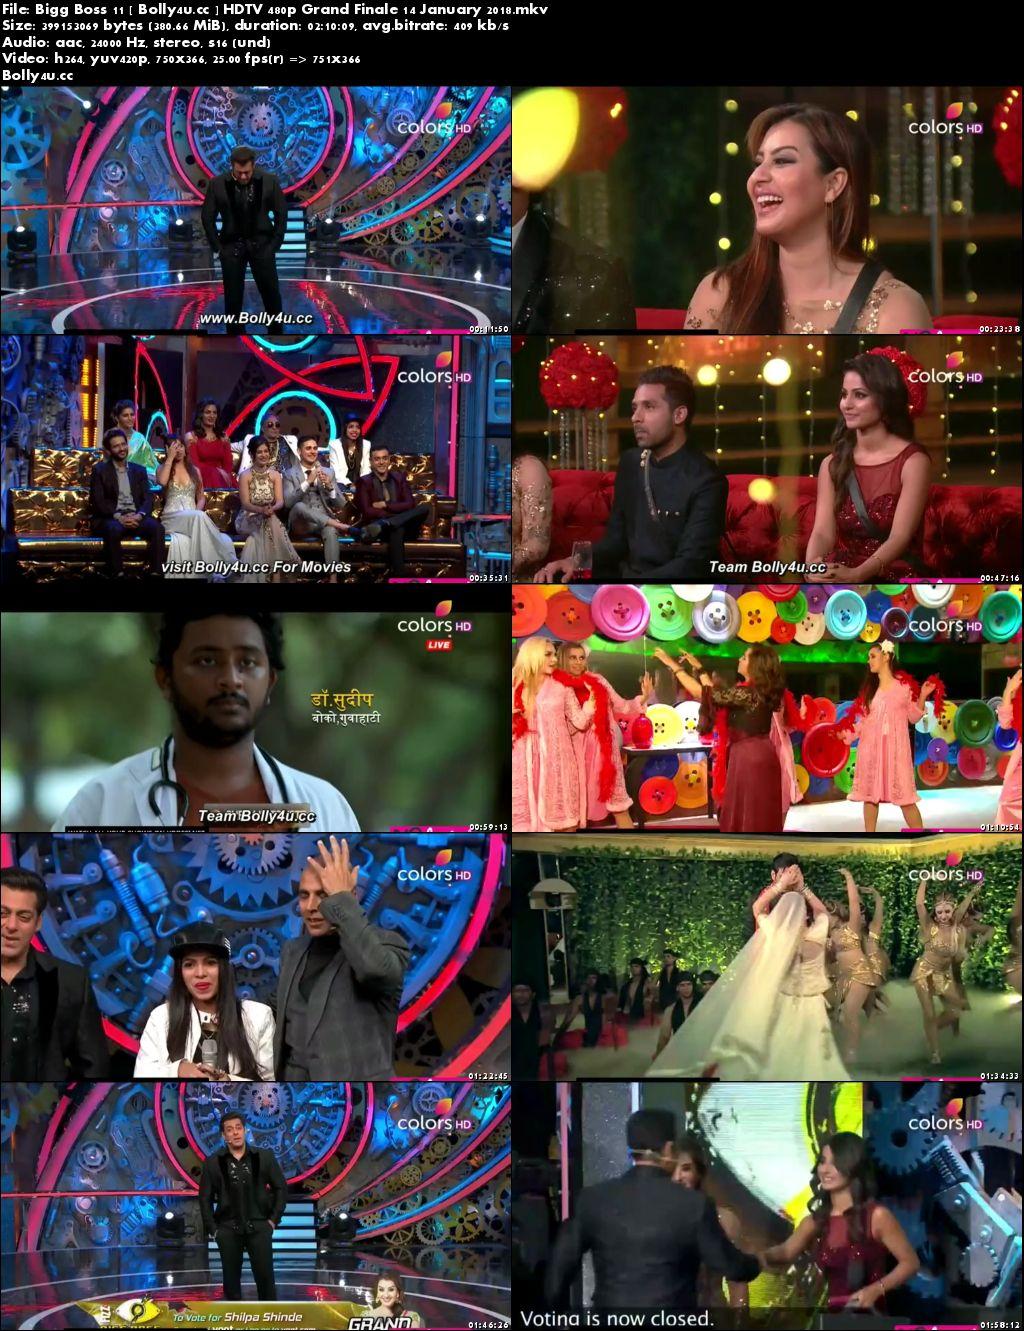 Bigg Boss S11E106 HDTV 350MB 480p Grand Finale 14 January 2018 Download